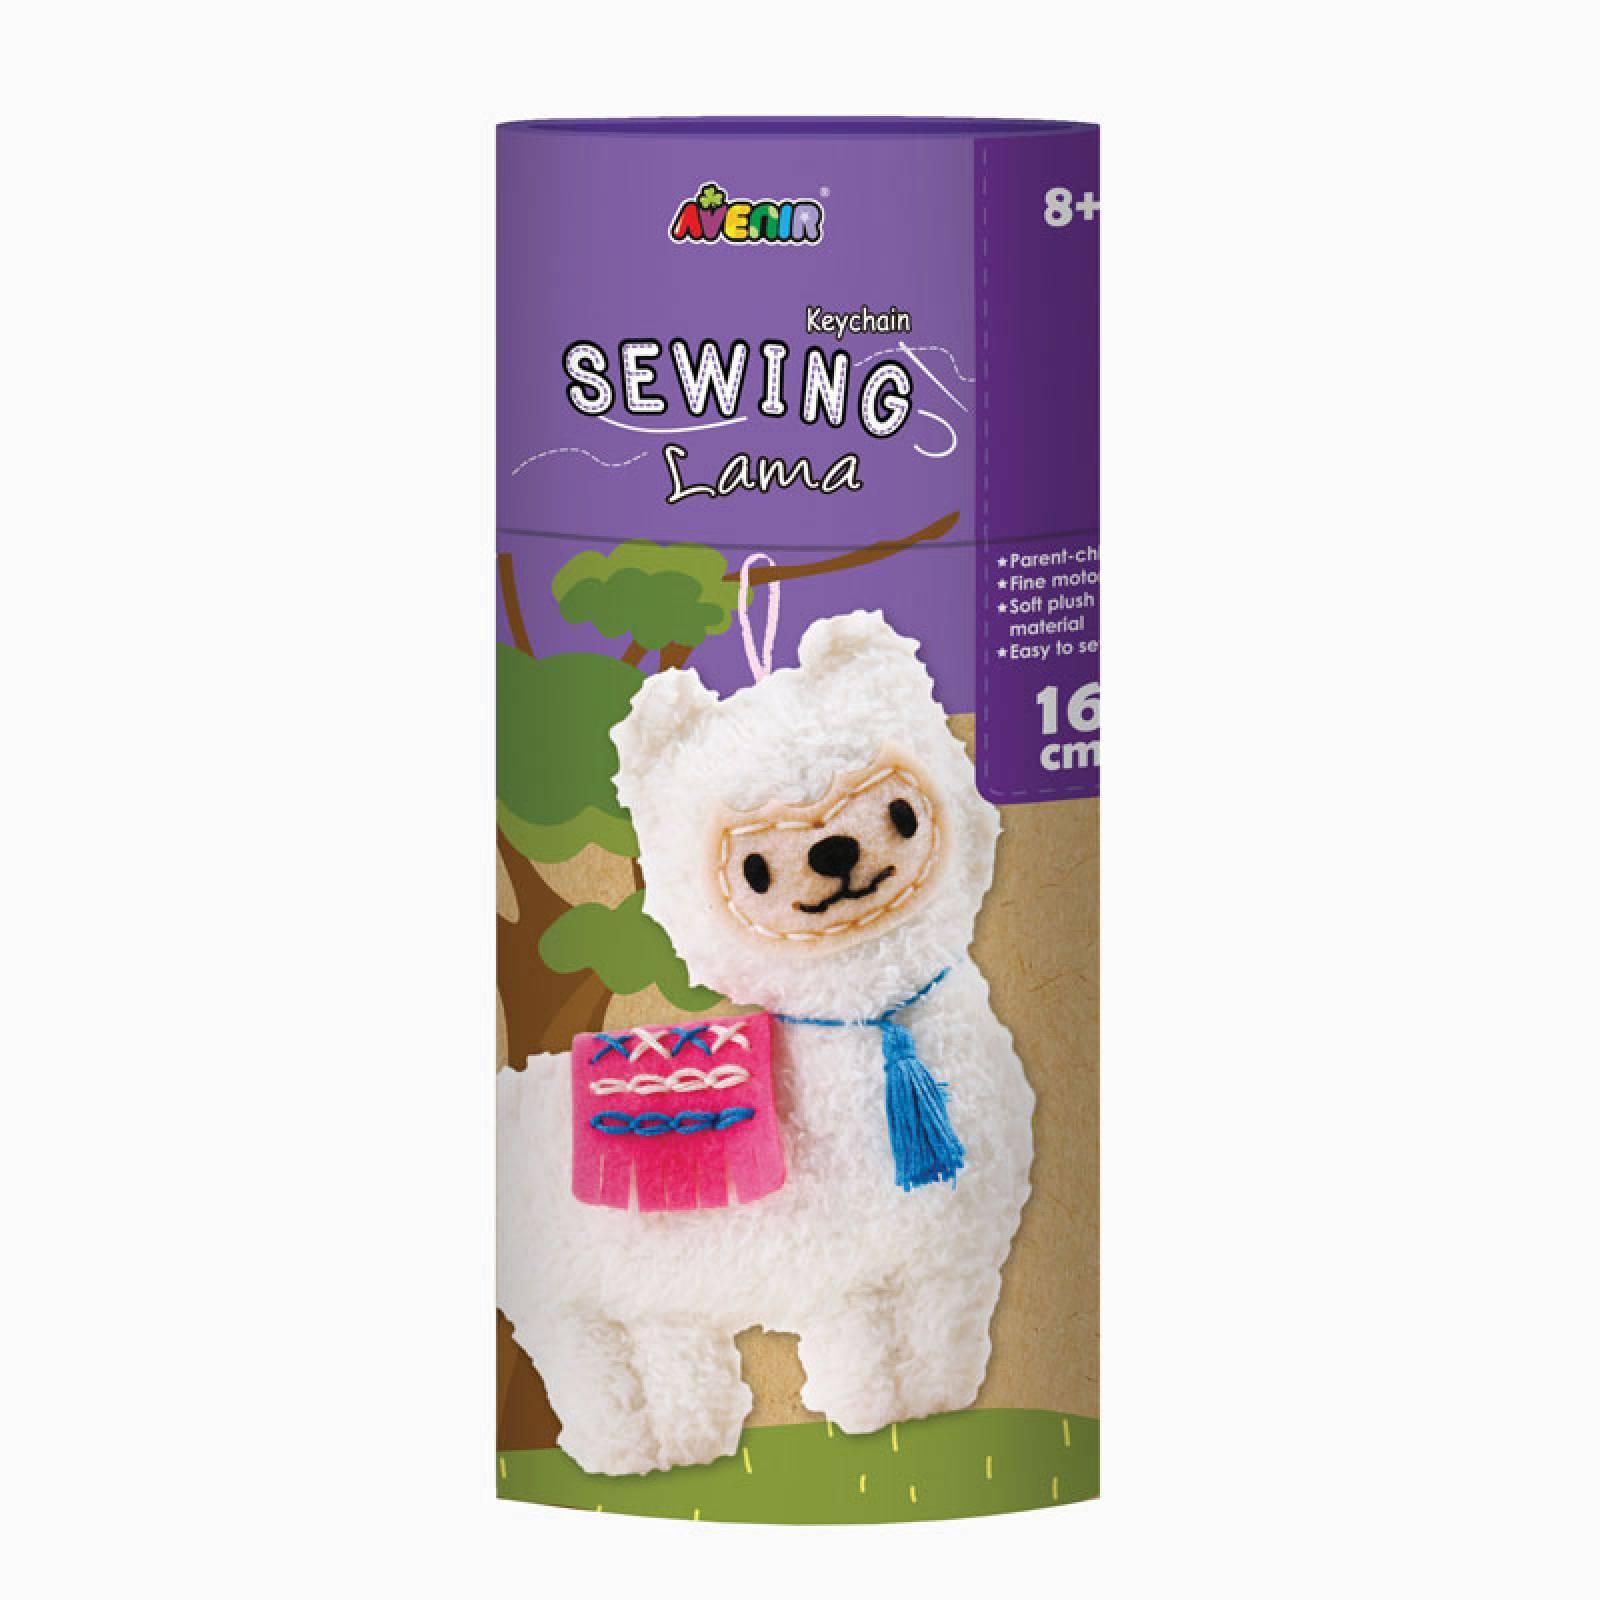 Keychain Sewing Kit - Llama 8+